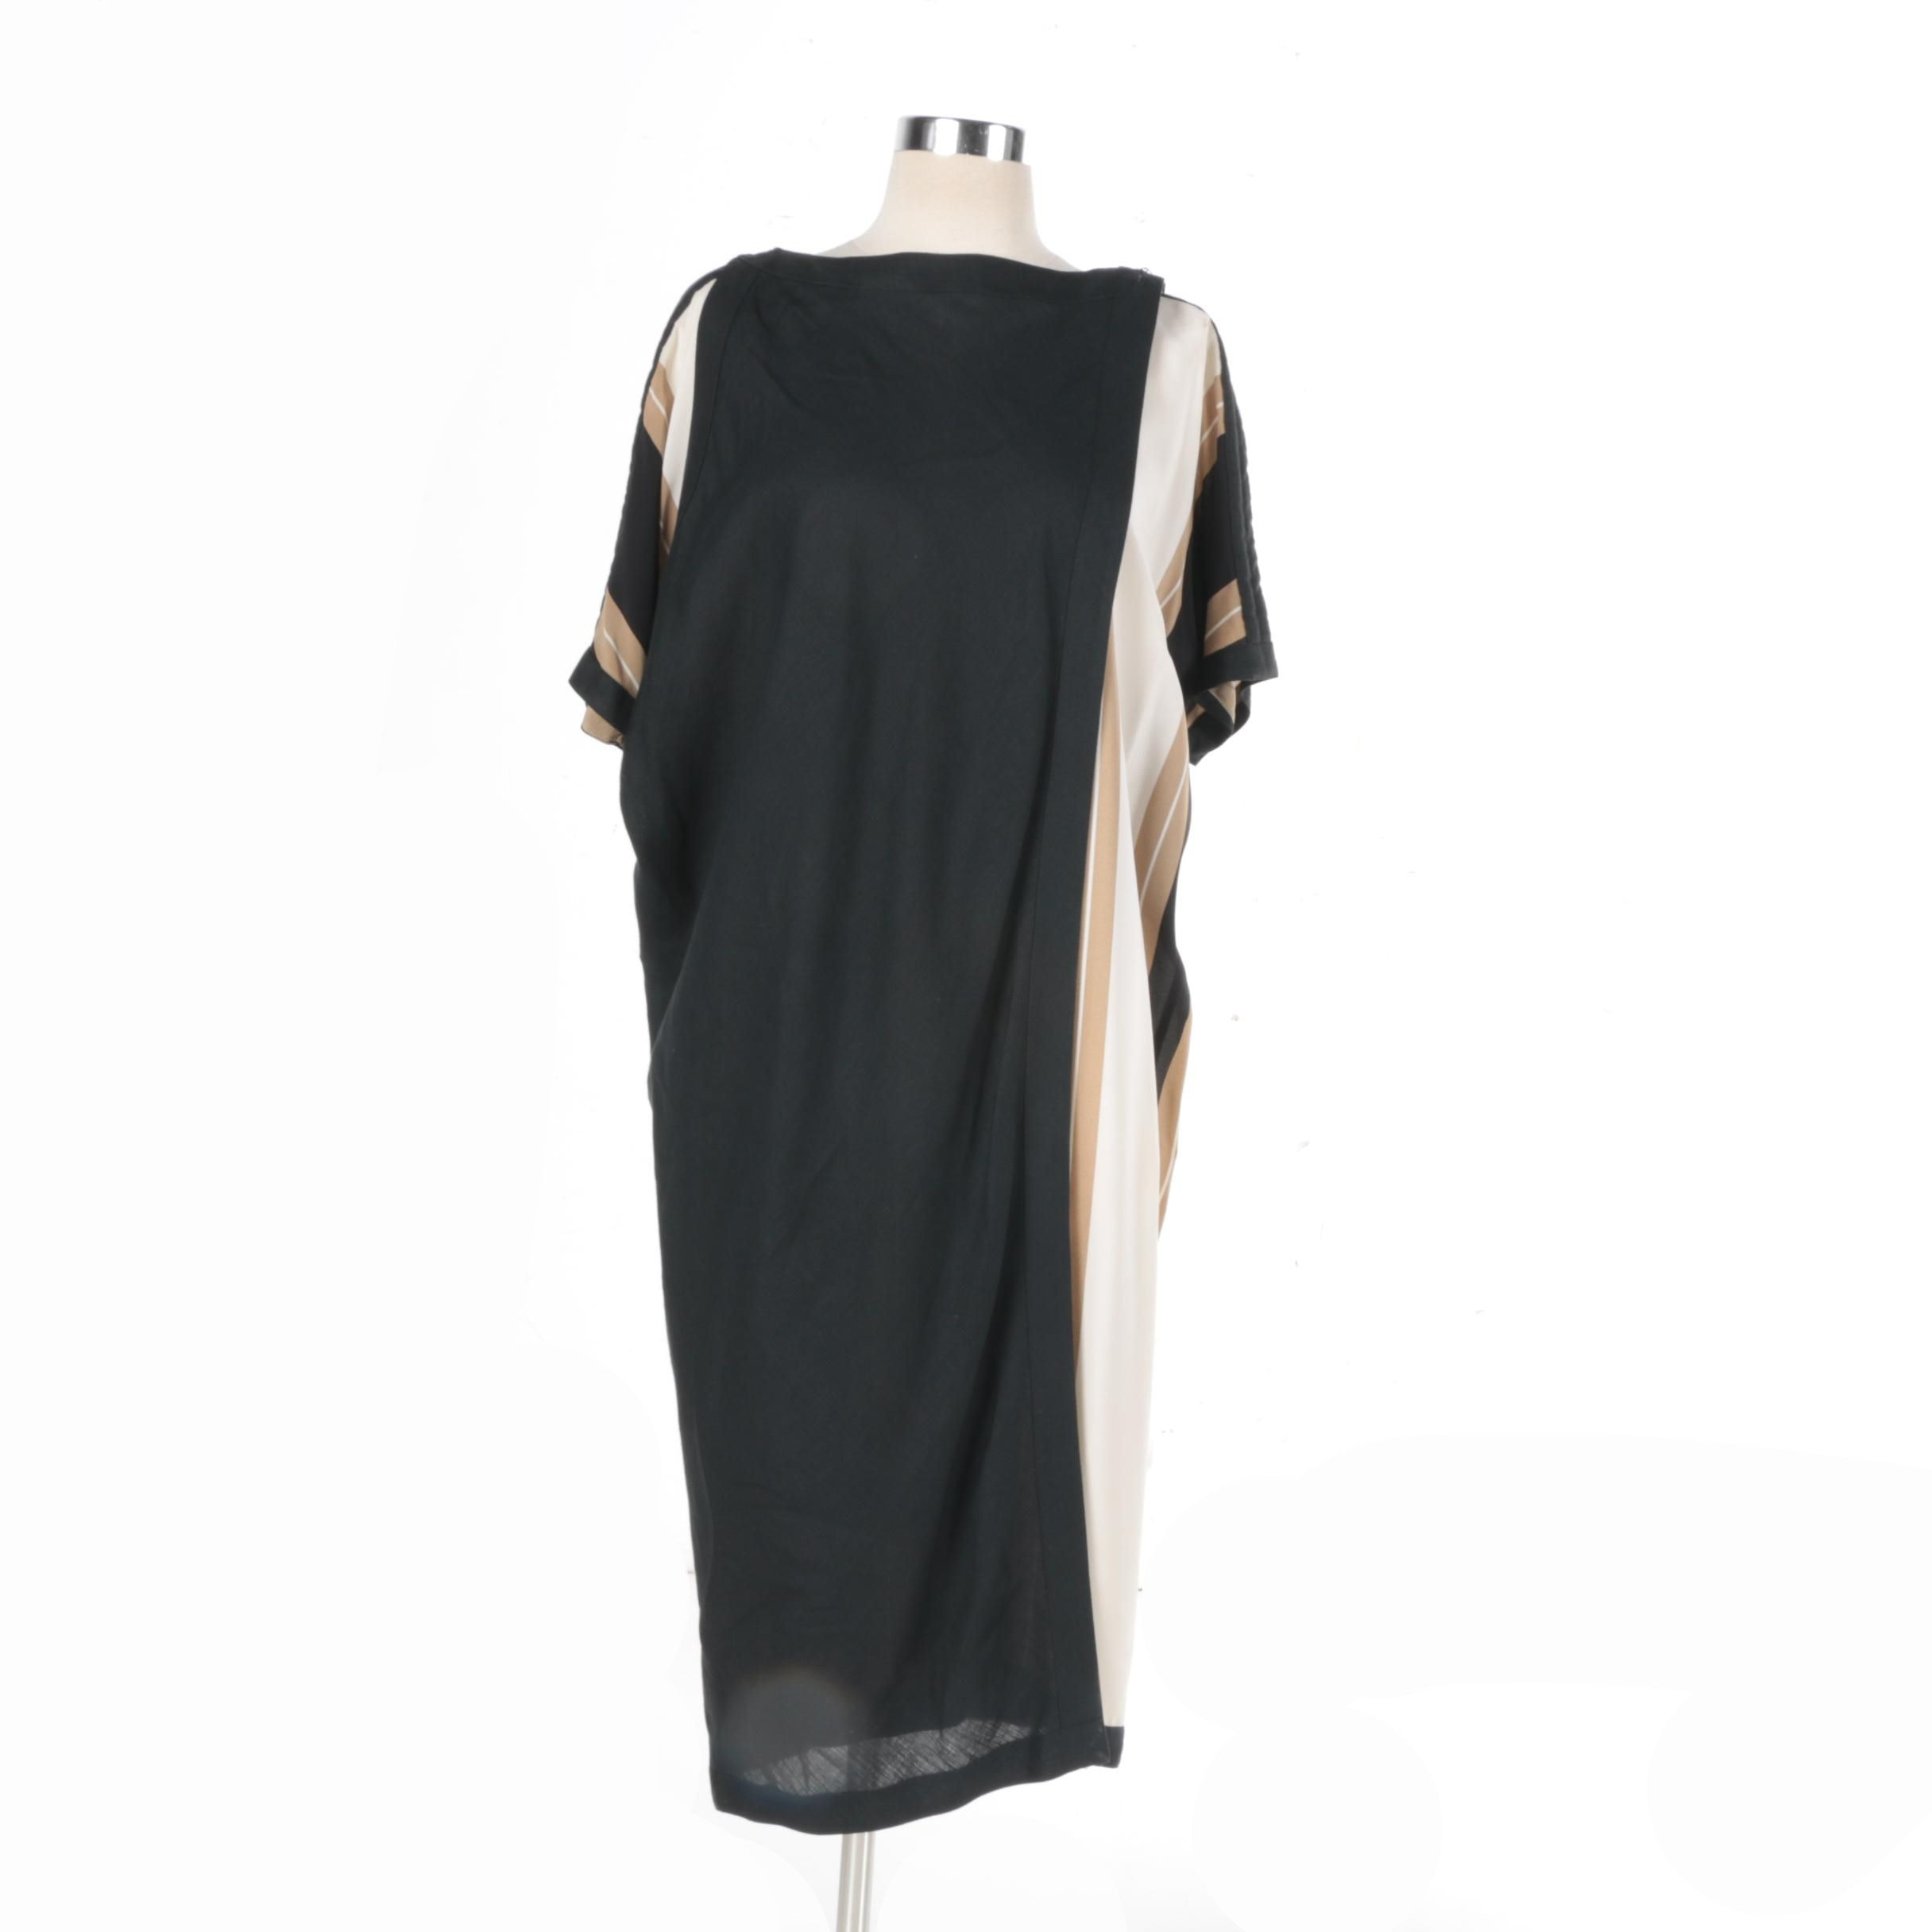 1970s-1980s Vintage Gianni Versace Silk Dress